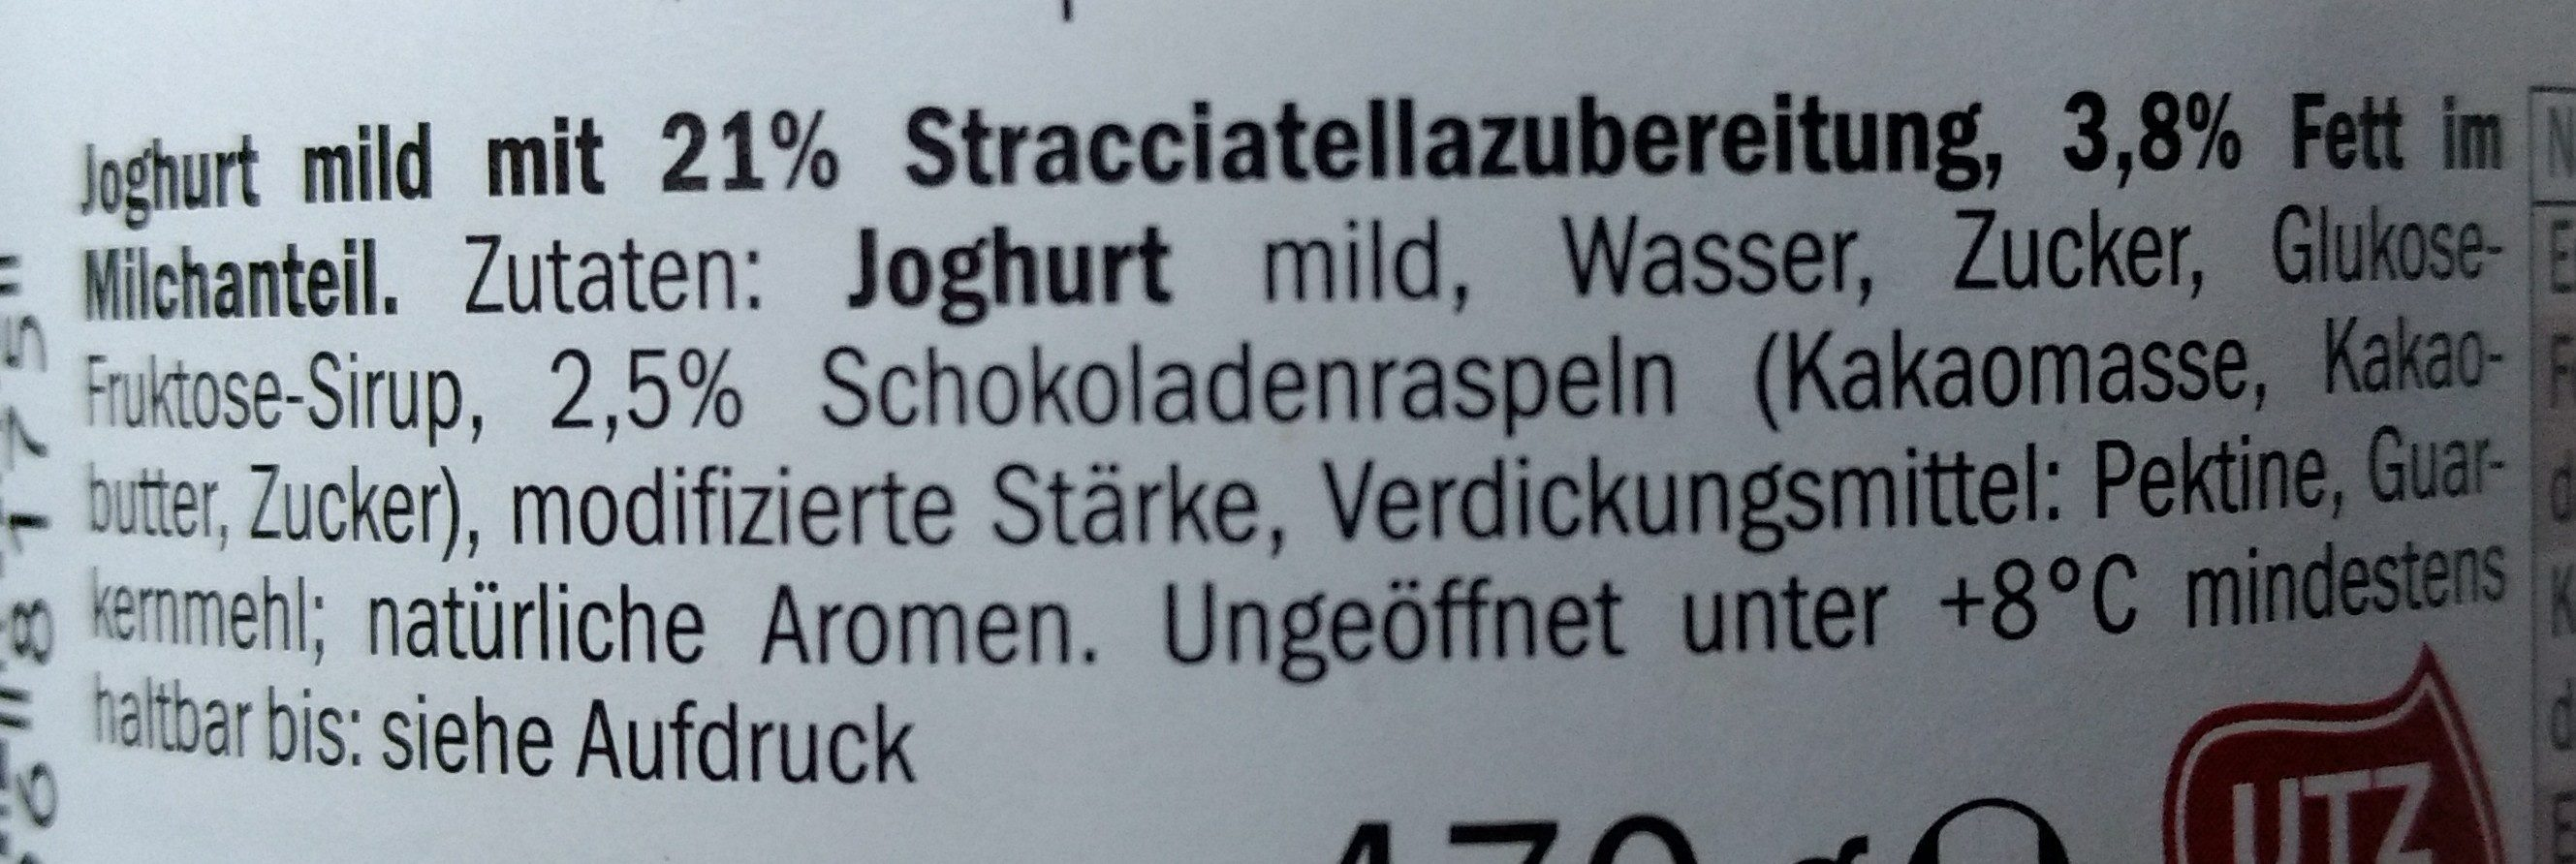 Alpenjoghurt Stracciatella - Ingrediënten - de